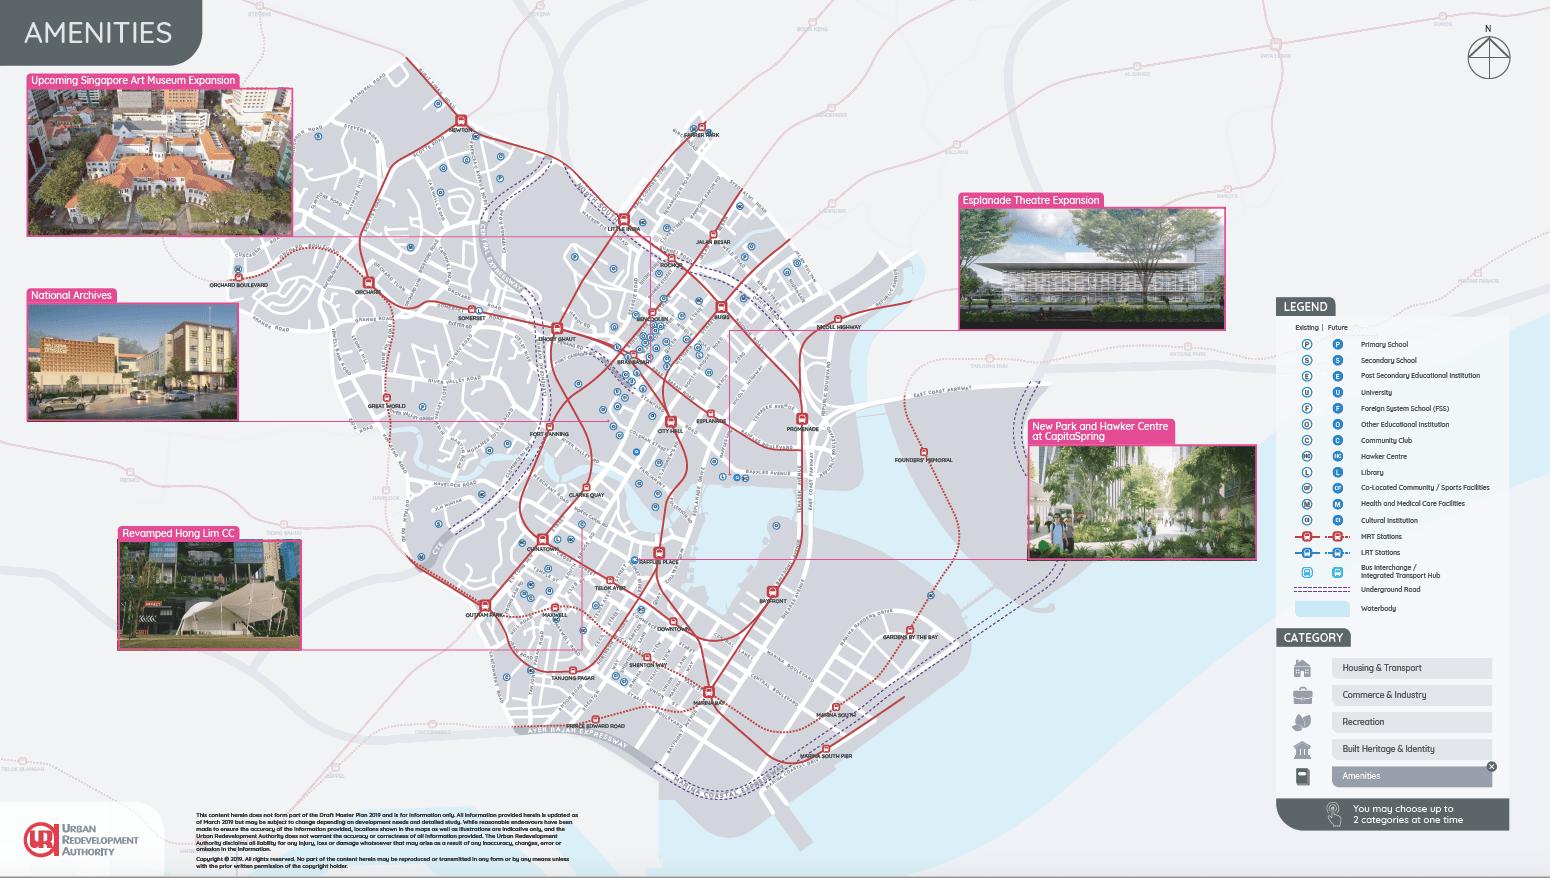 one-bernam-central-area-illustrated-plans-amenities | One Bernam